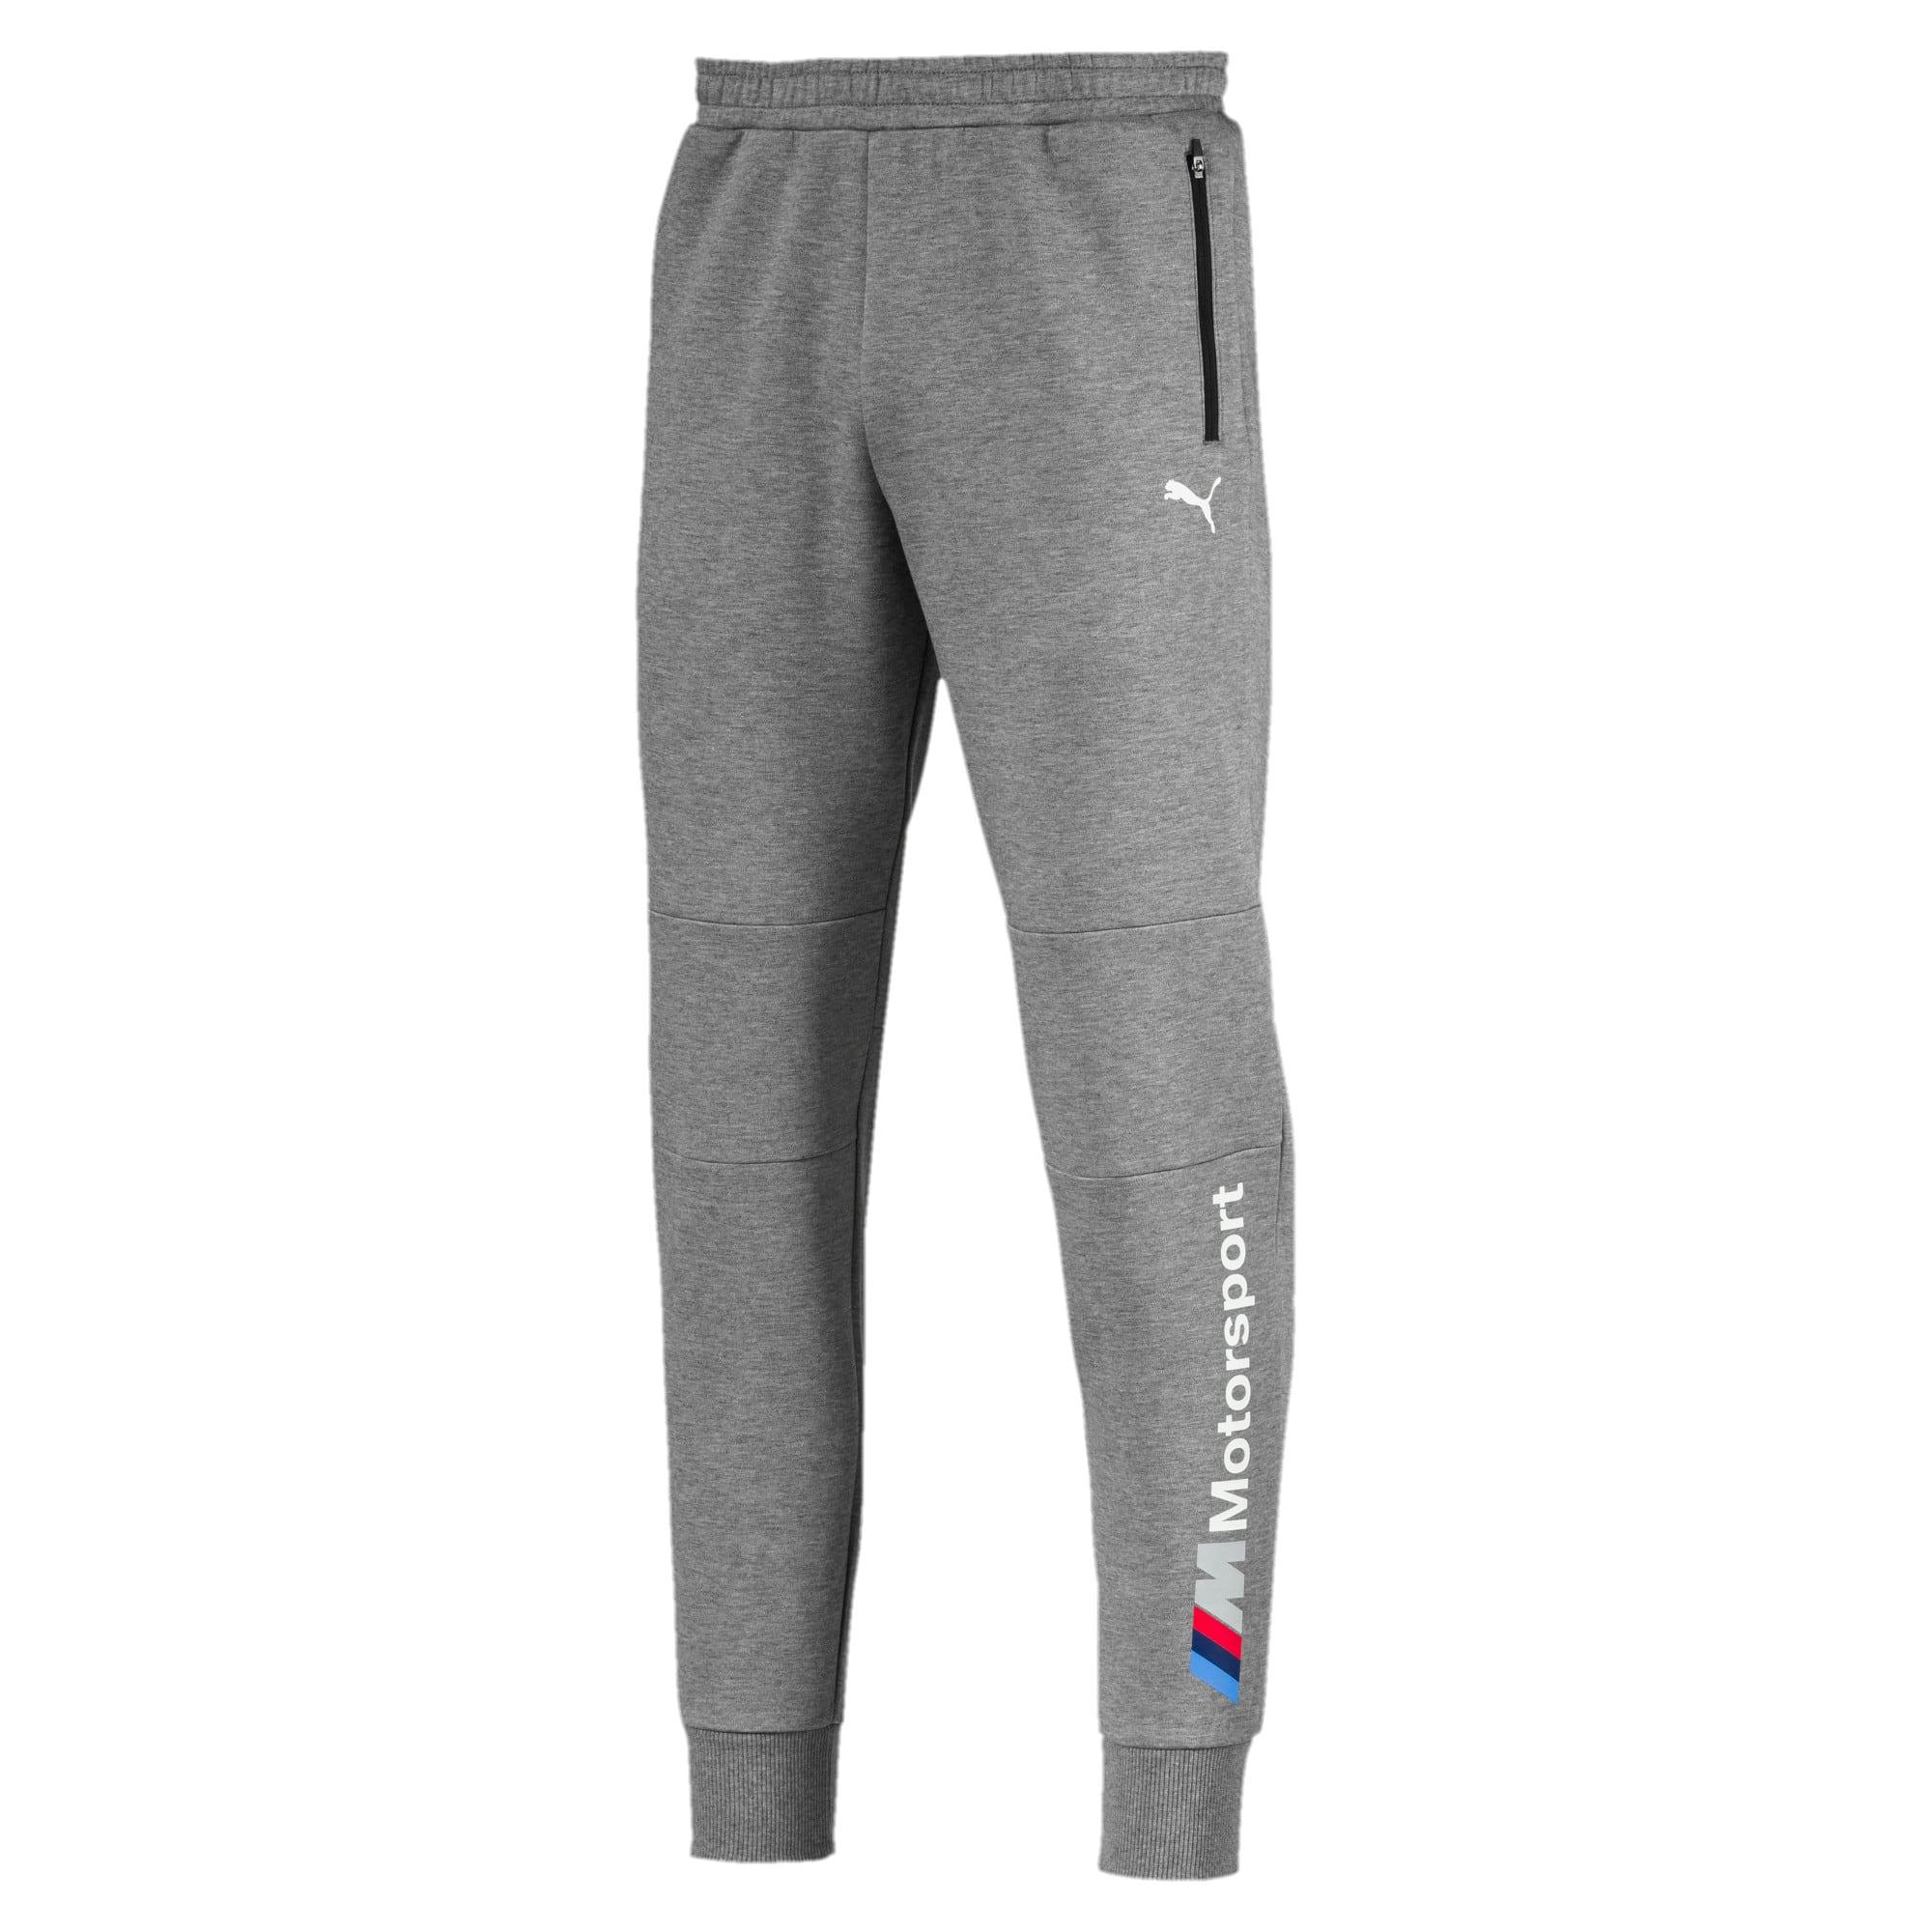 Thumbnail 1 of BMW Men's Sweatpants, Medium Gray Heather, medium